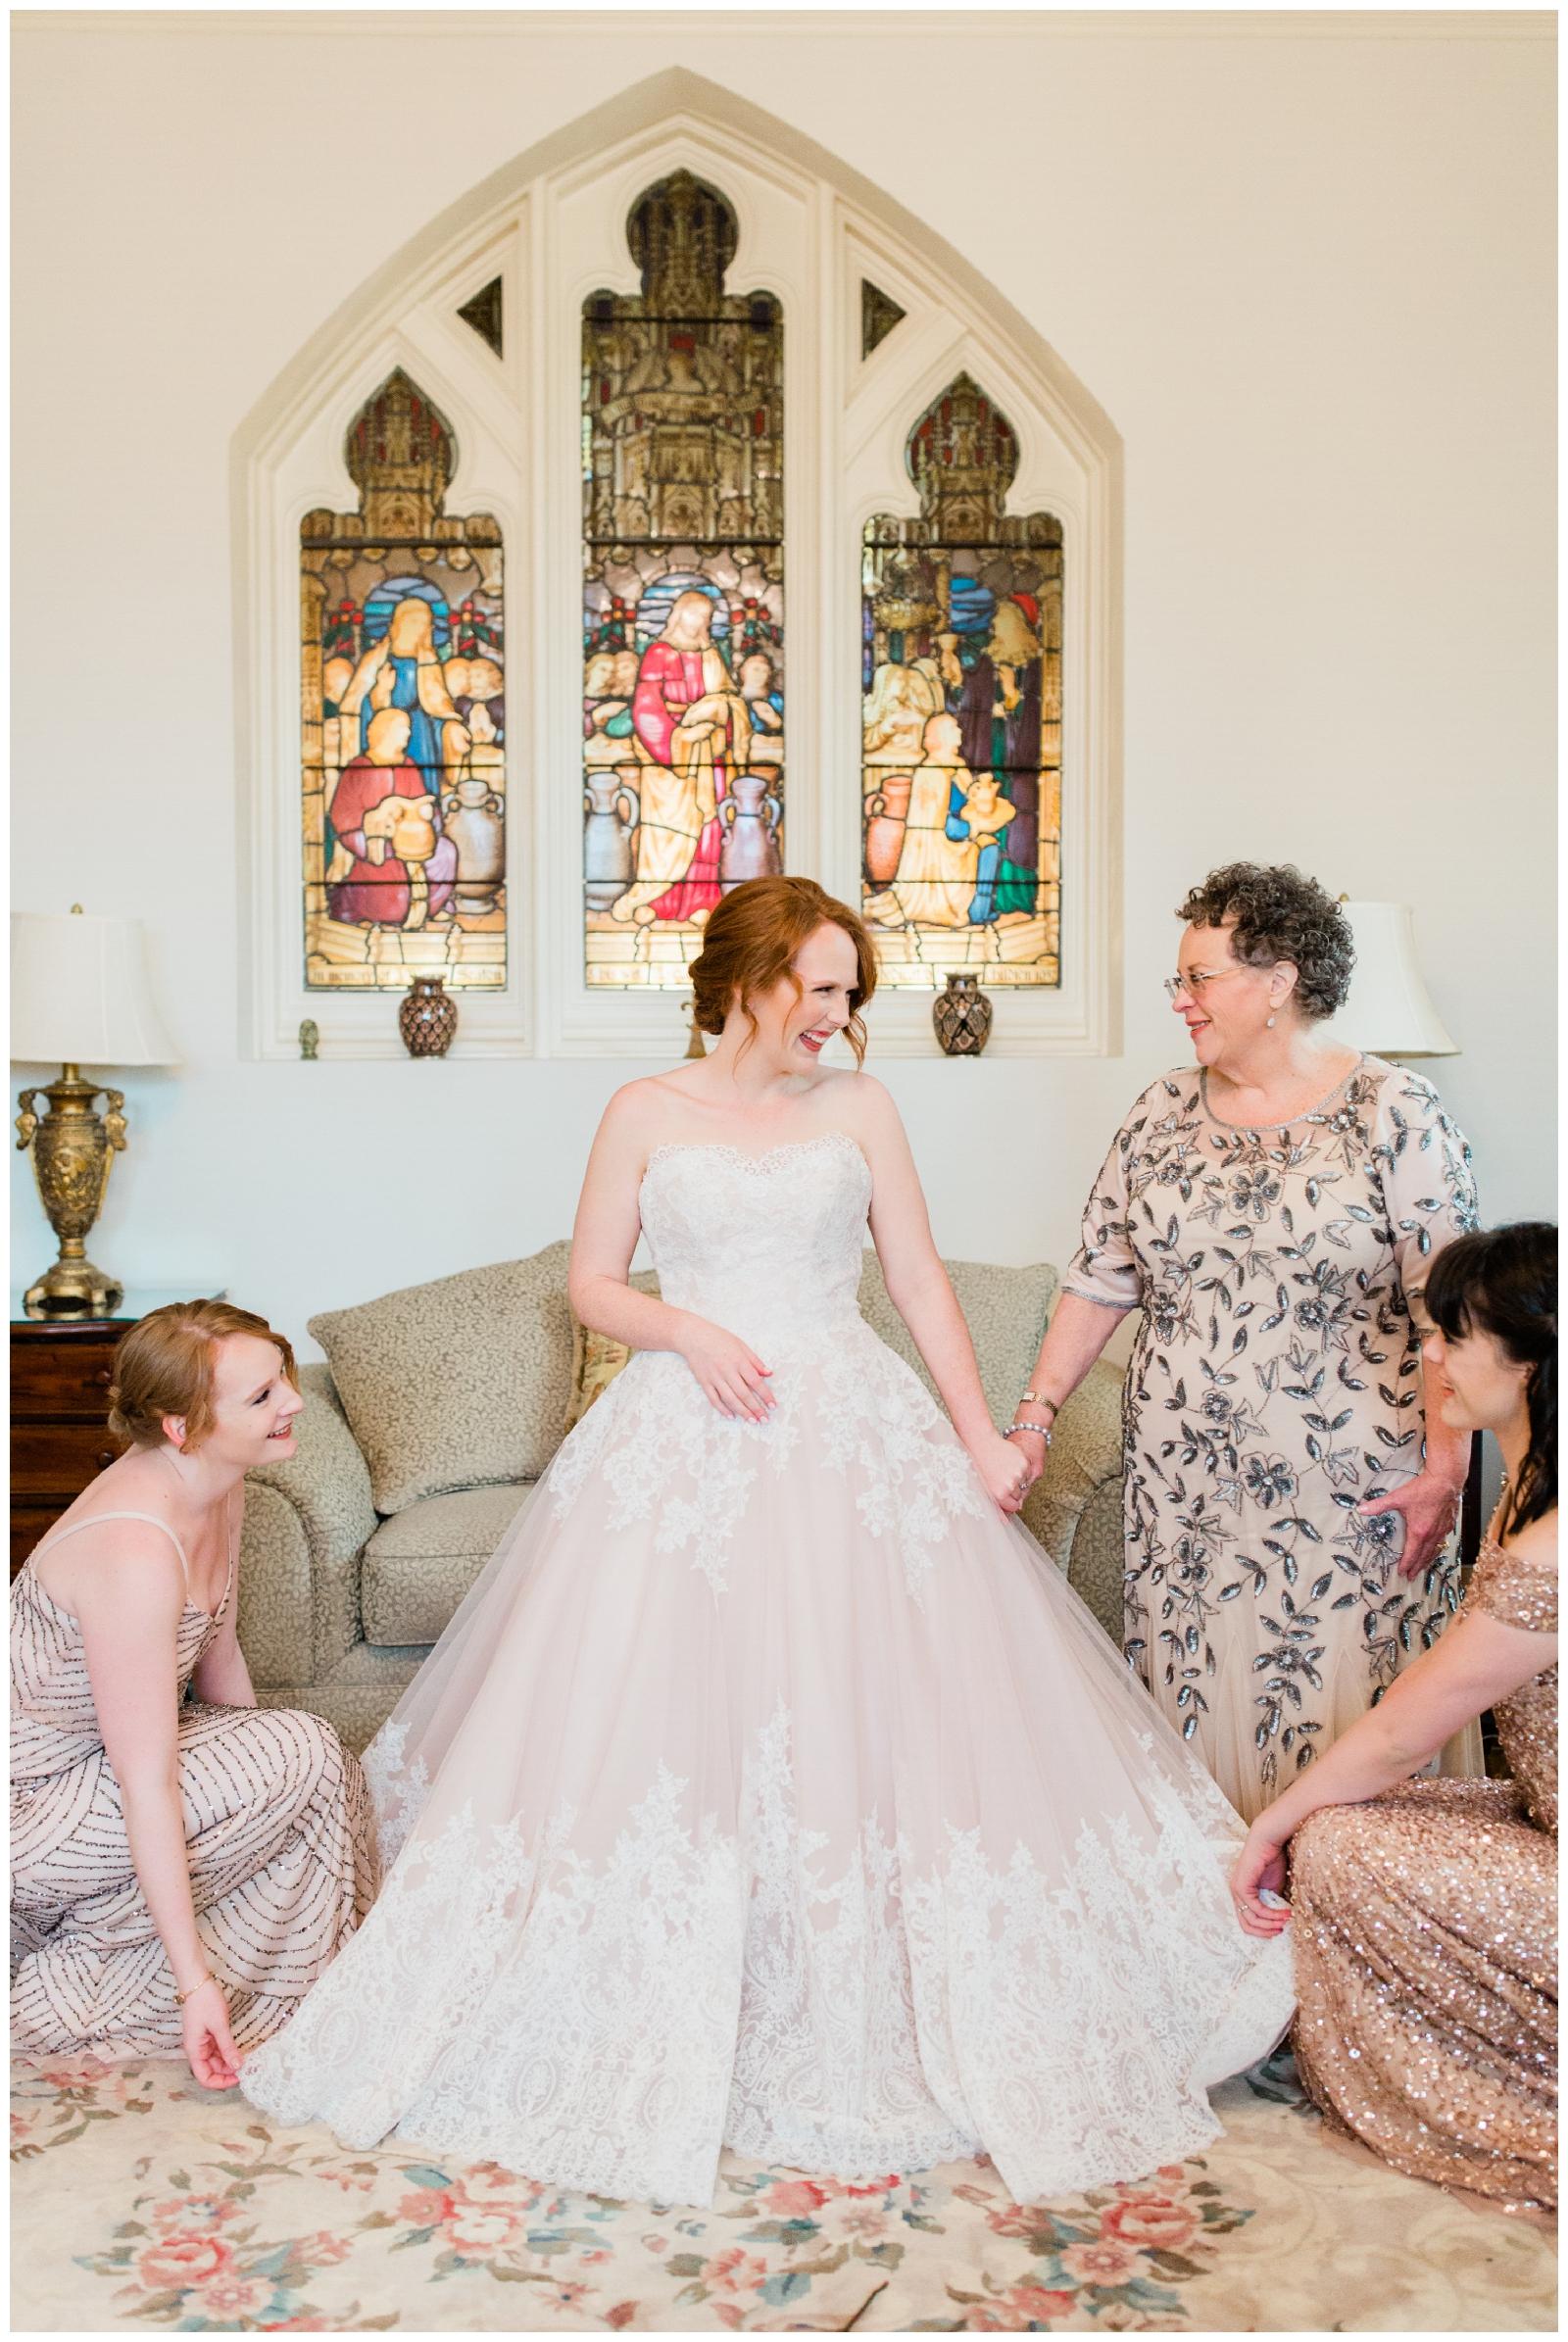 Zola-Austin-Atlanta-Peachtree-Christian-Church-Chastain-Horse-Park-Wedding-0007.jpg